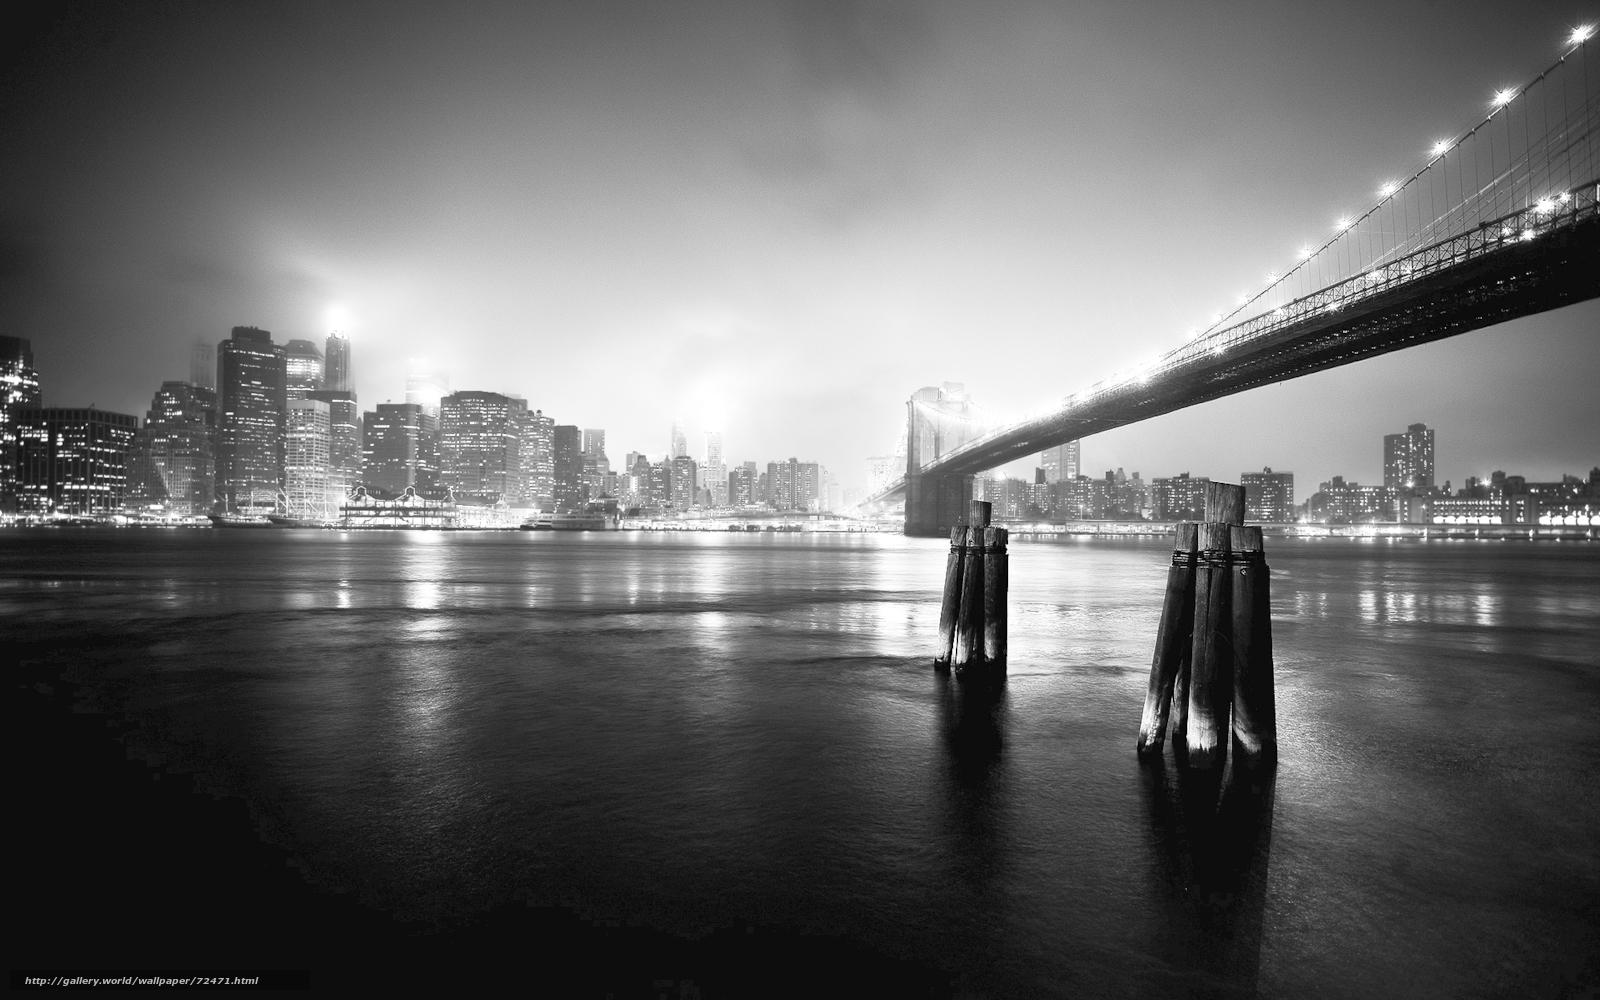 Hq gece, şehir, köprü, siyah beyaz fotoğraf, 1920x1200 resim